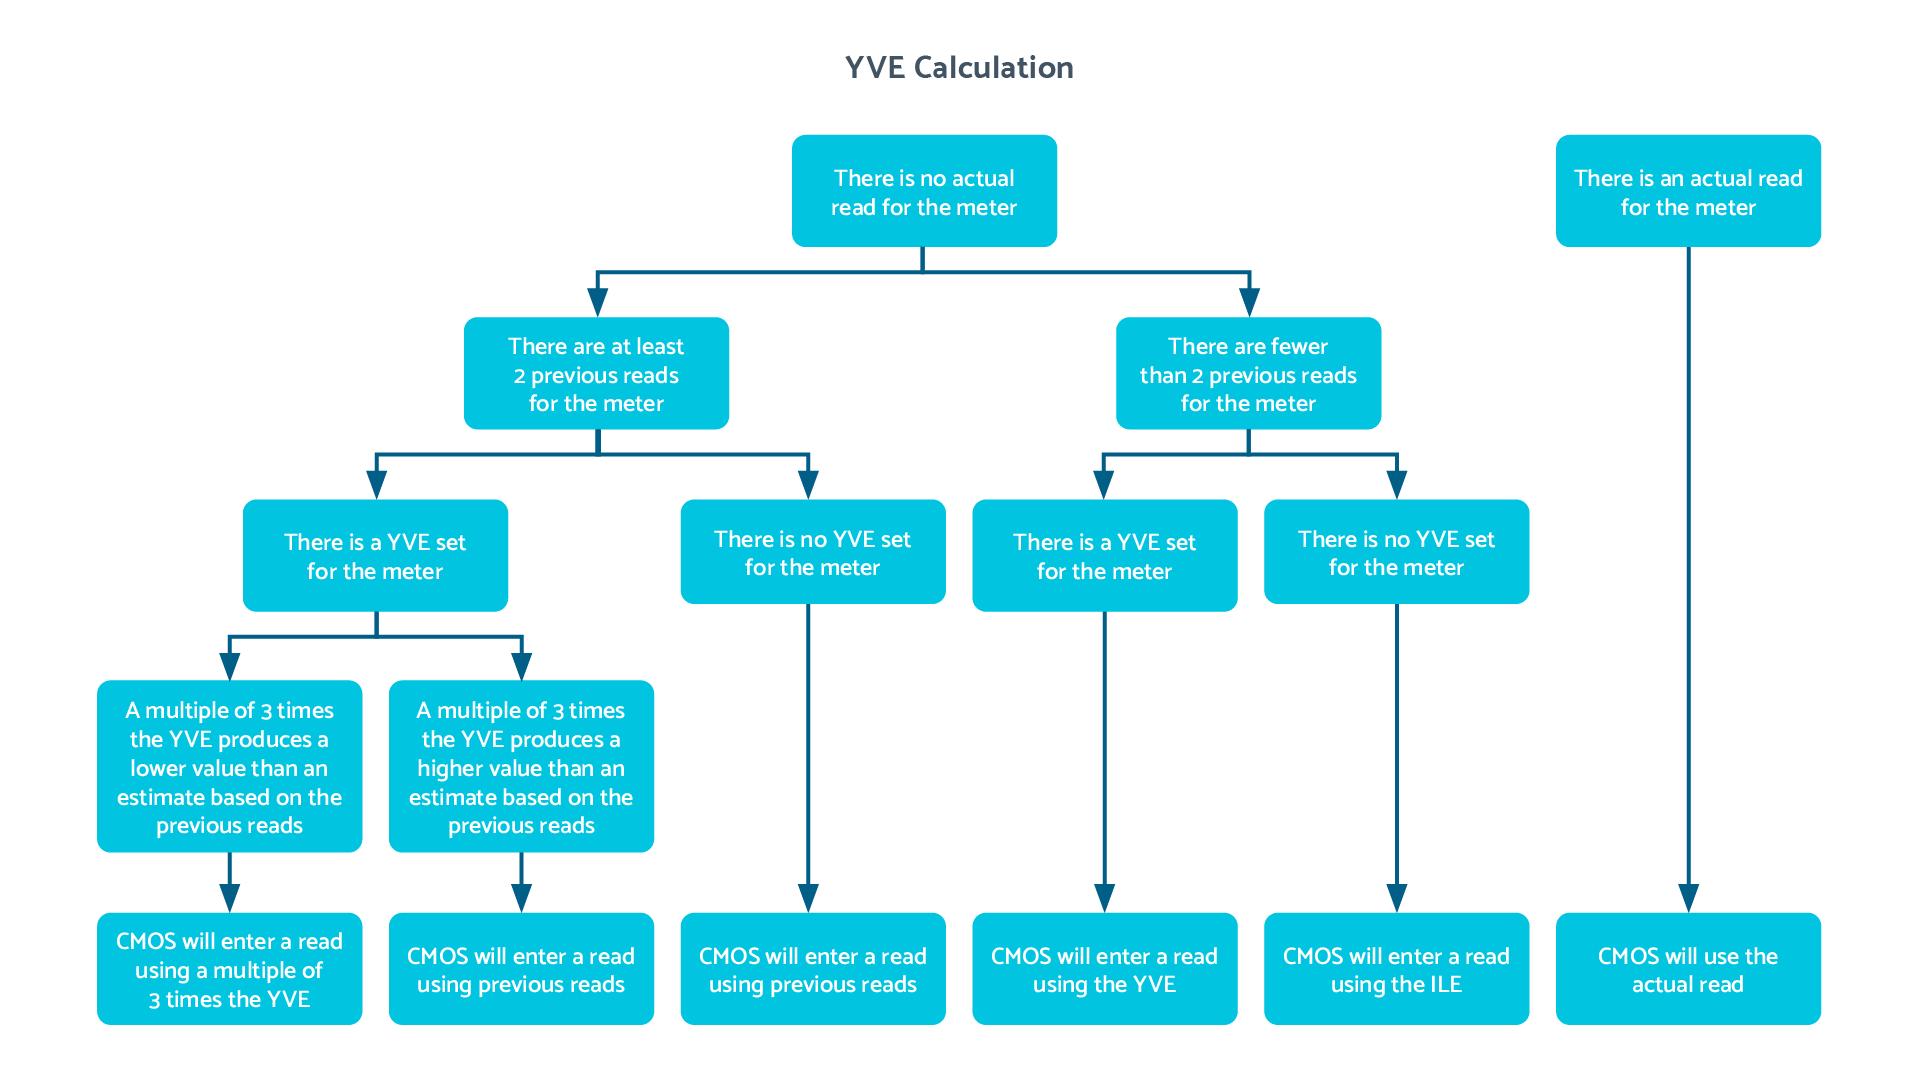 YVE Decision Flow Diagram